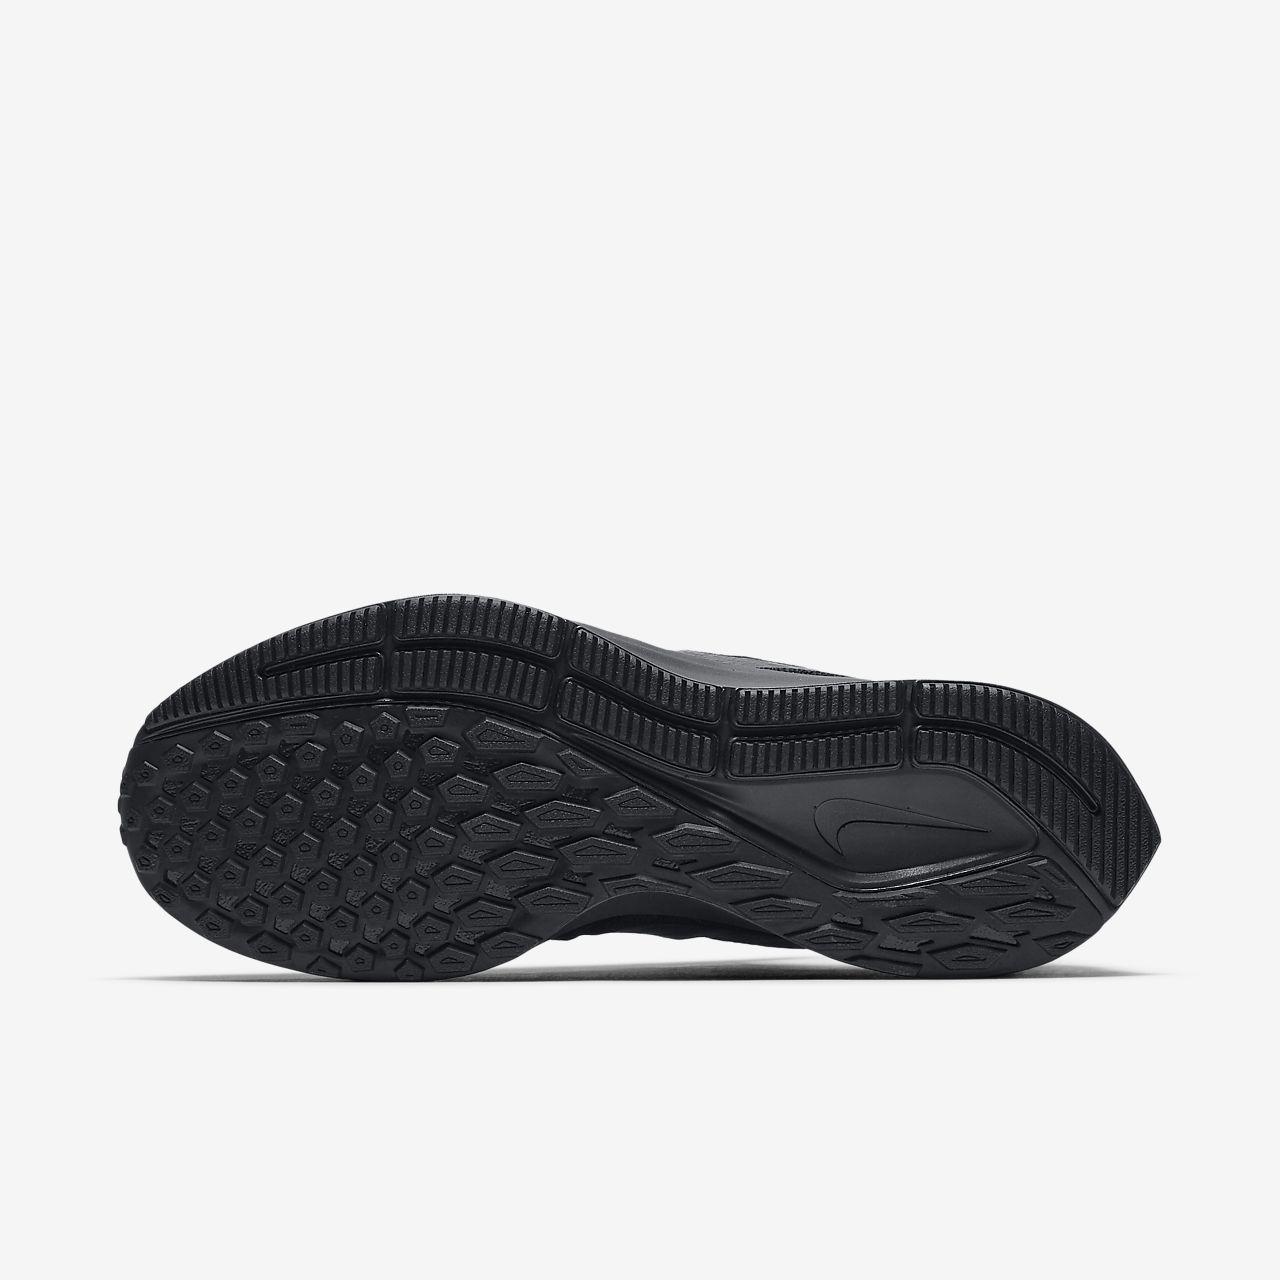 Nike Air Zoom Pegasus 35 Women's Running Shoe sole